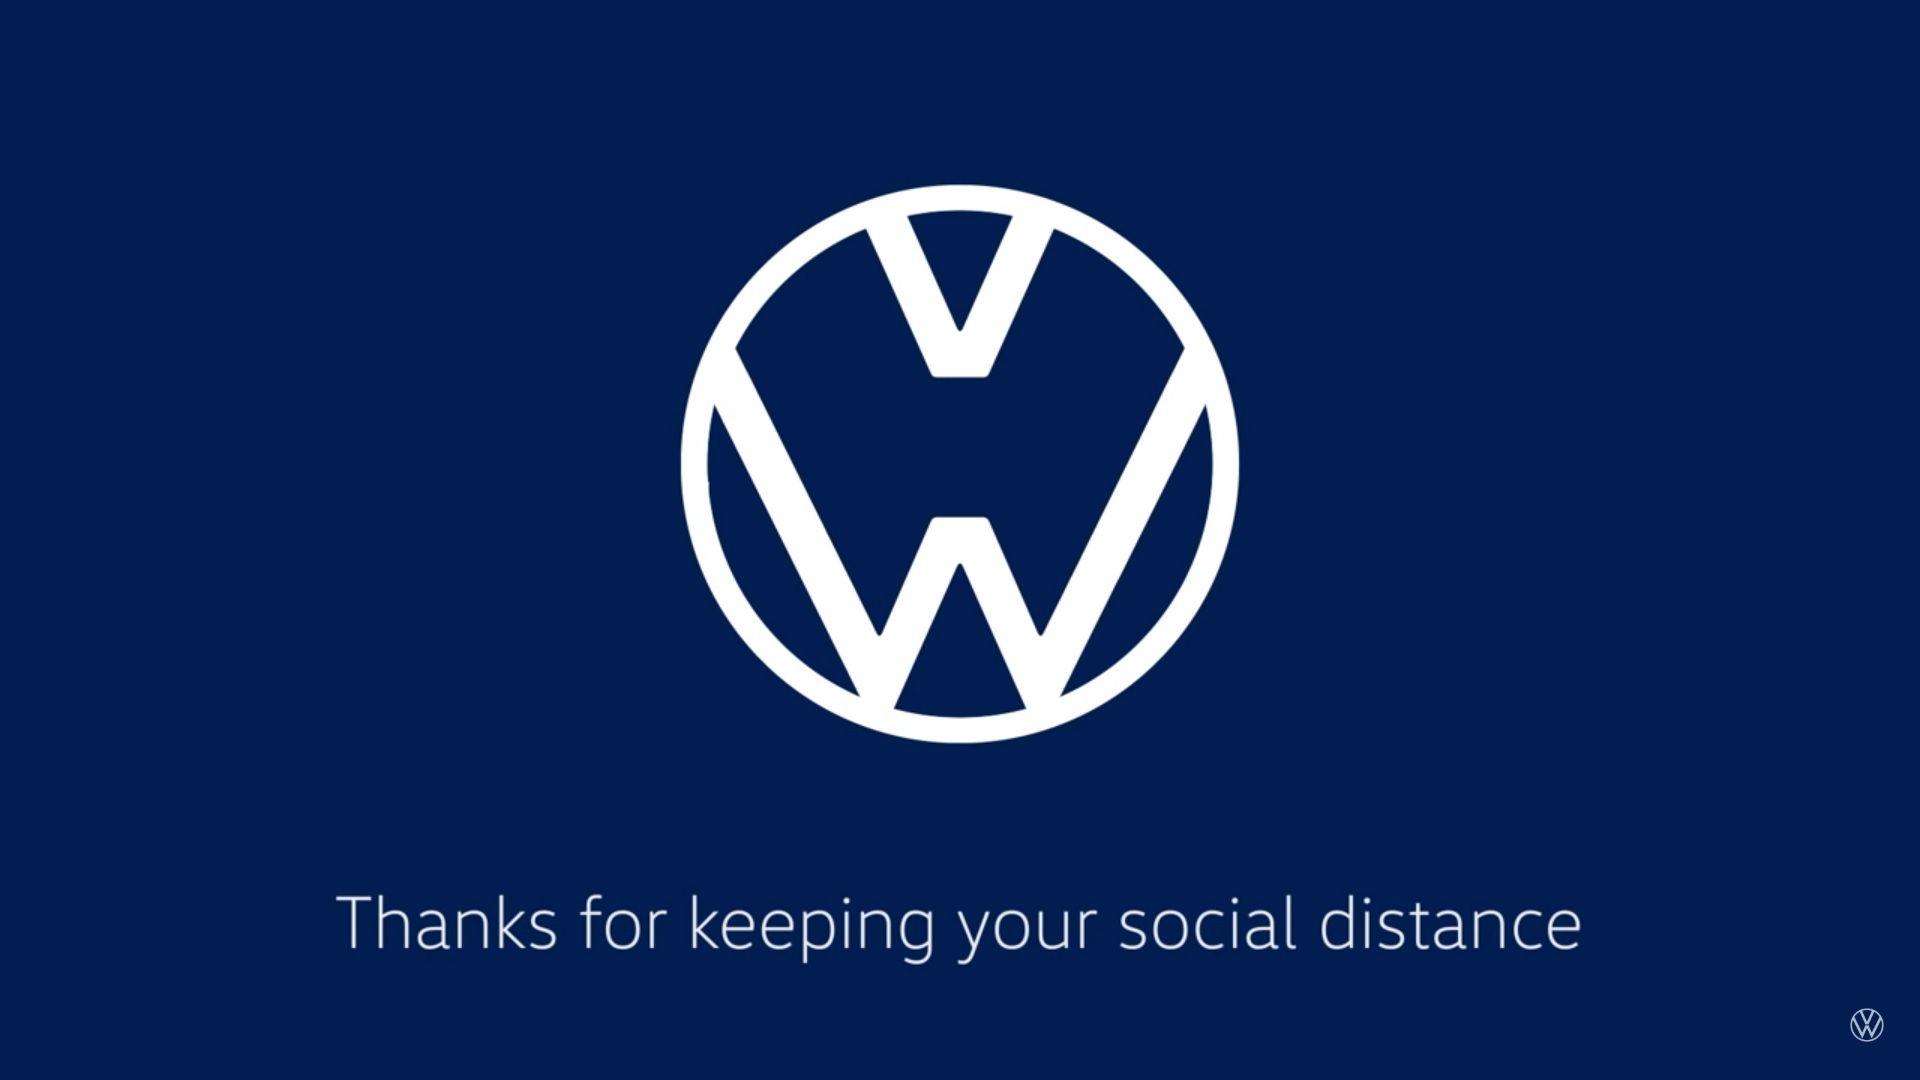 Mercedes Benz Audi And Volkswagen Show New Logos To Encourage Social Distancing Top Speed In 2020 Volkswagen Logo Redesign Volkswagen Logo